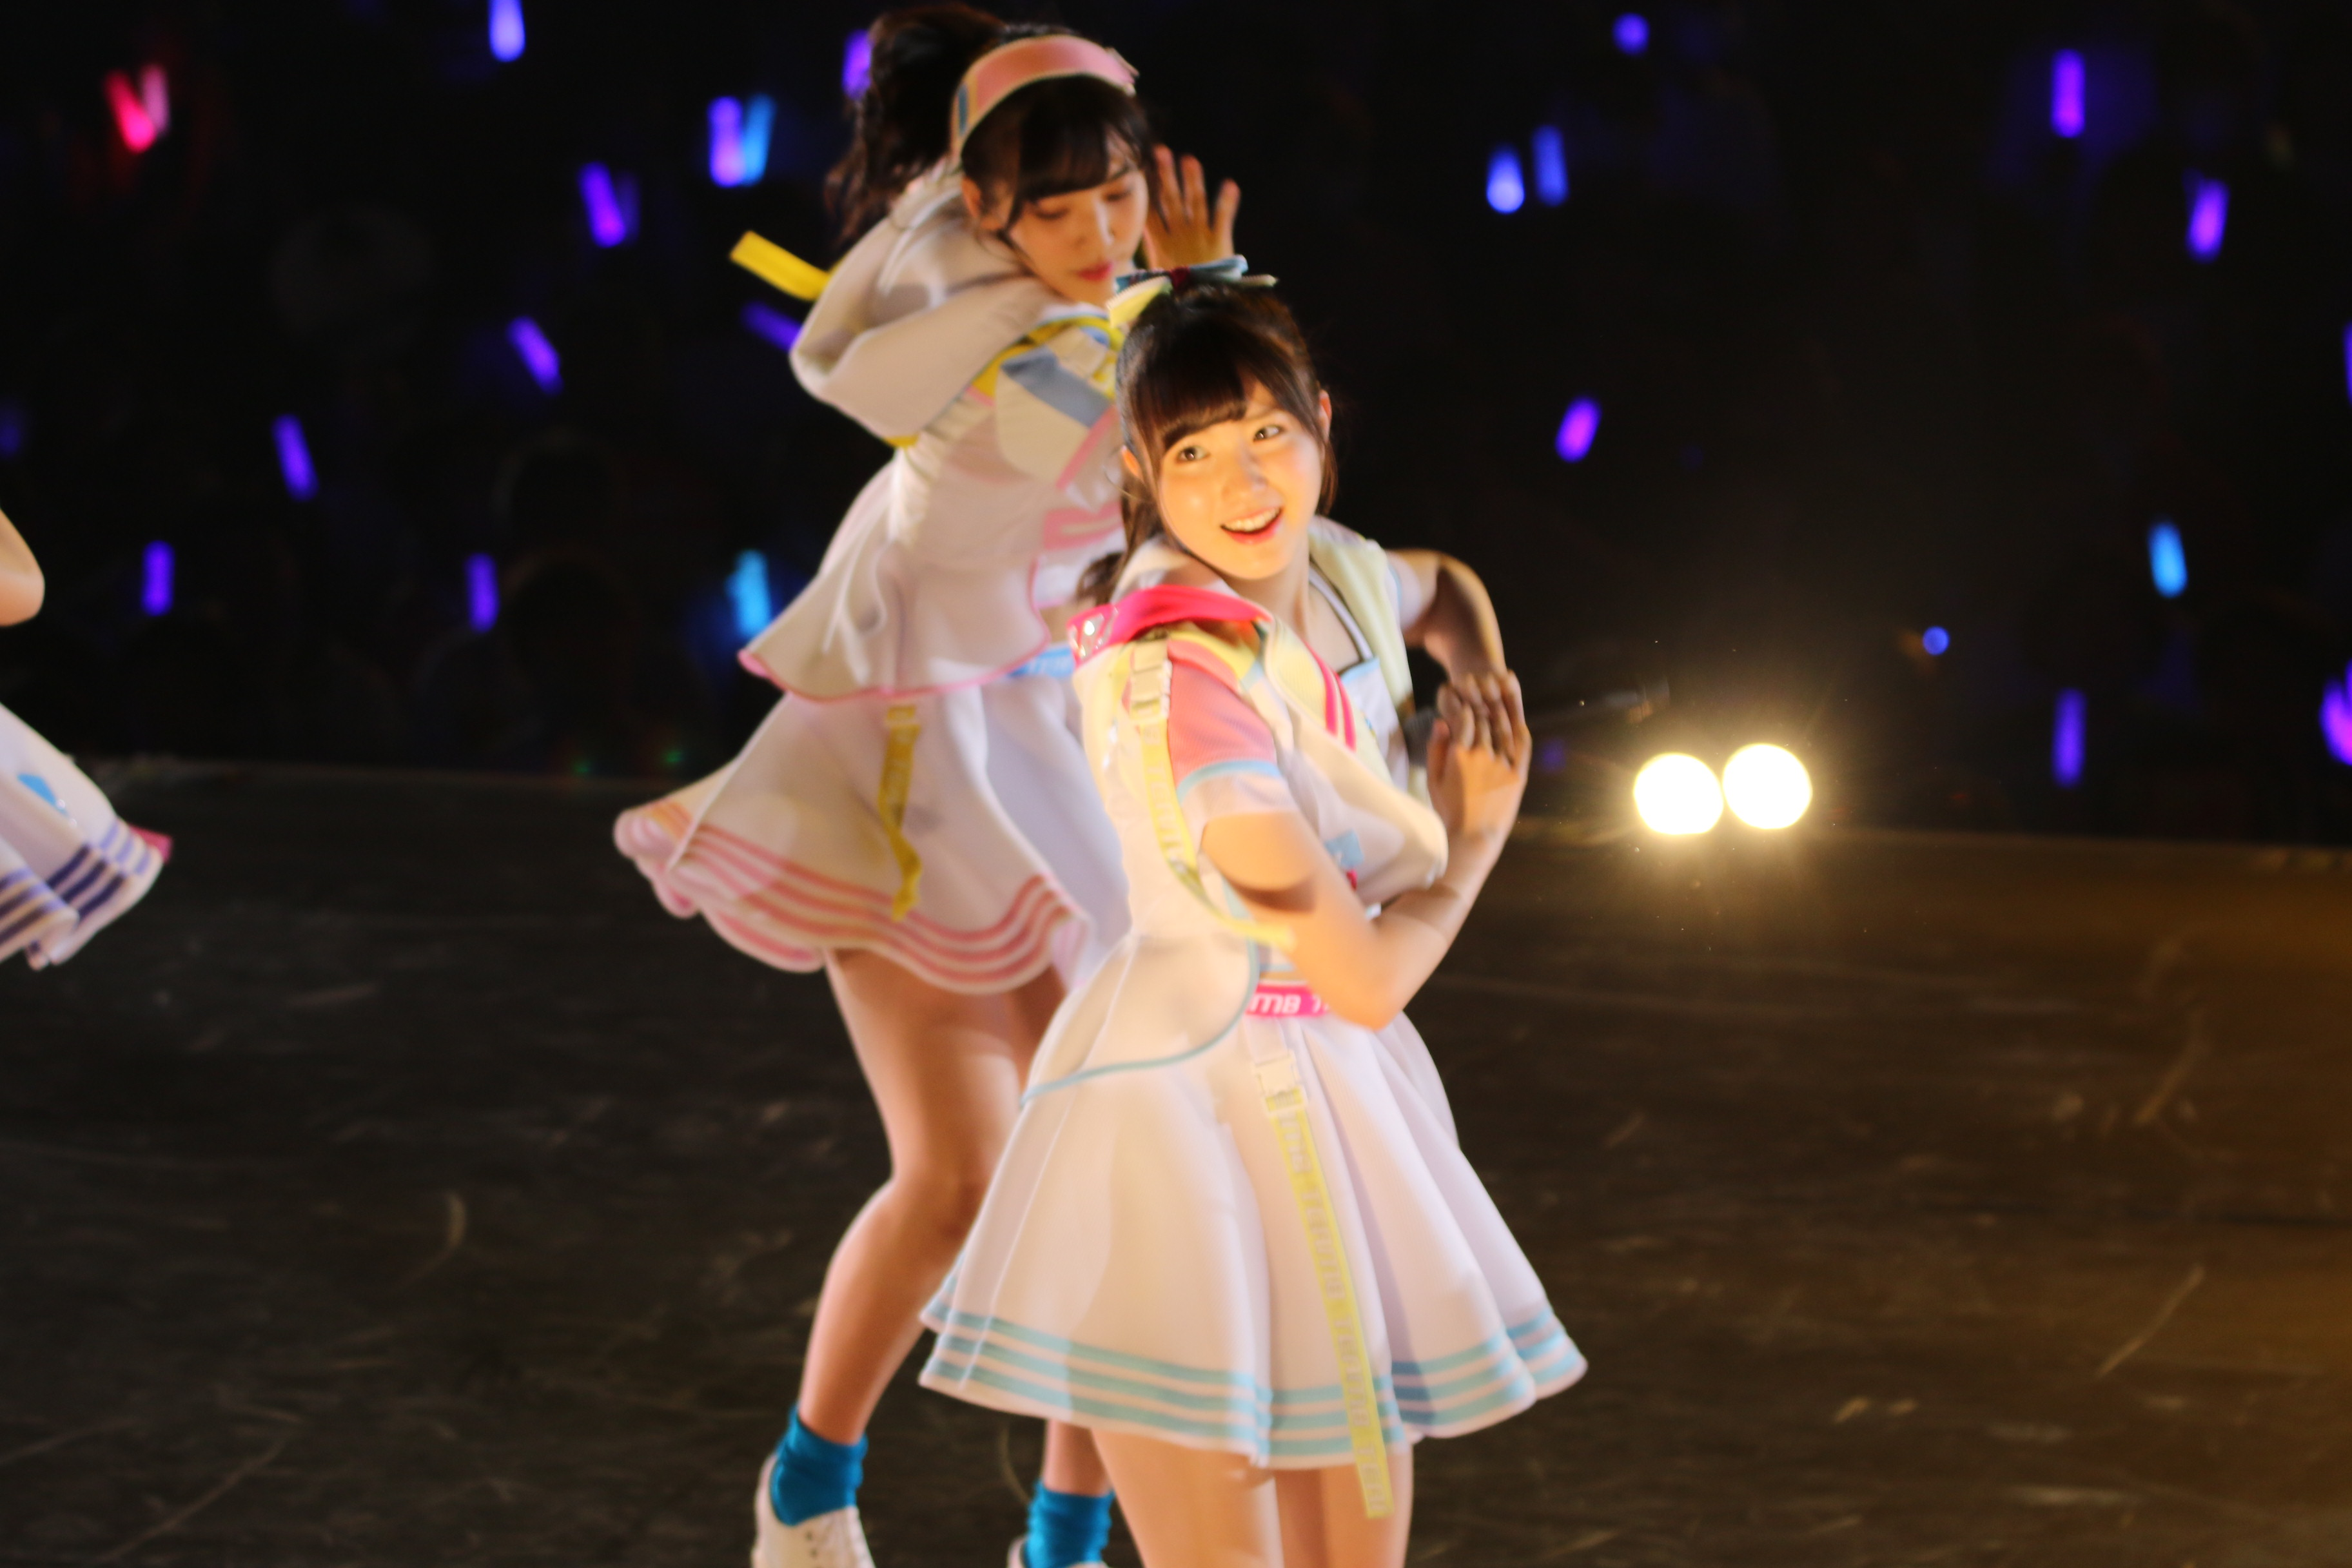 AKB48単独コンサート@SSA での本田仁美